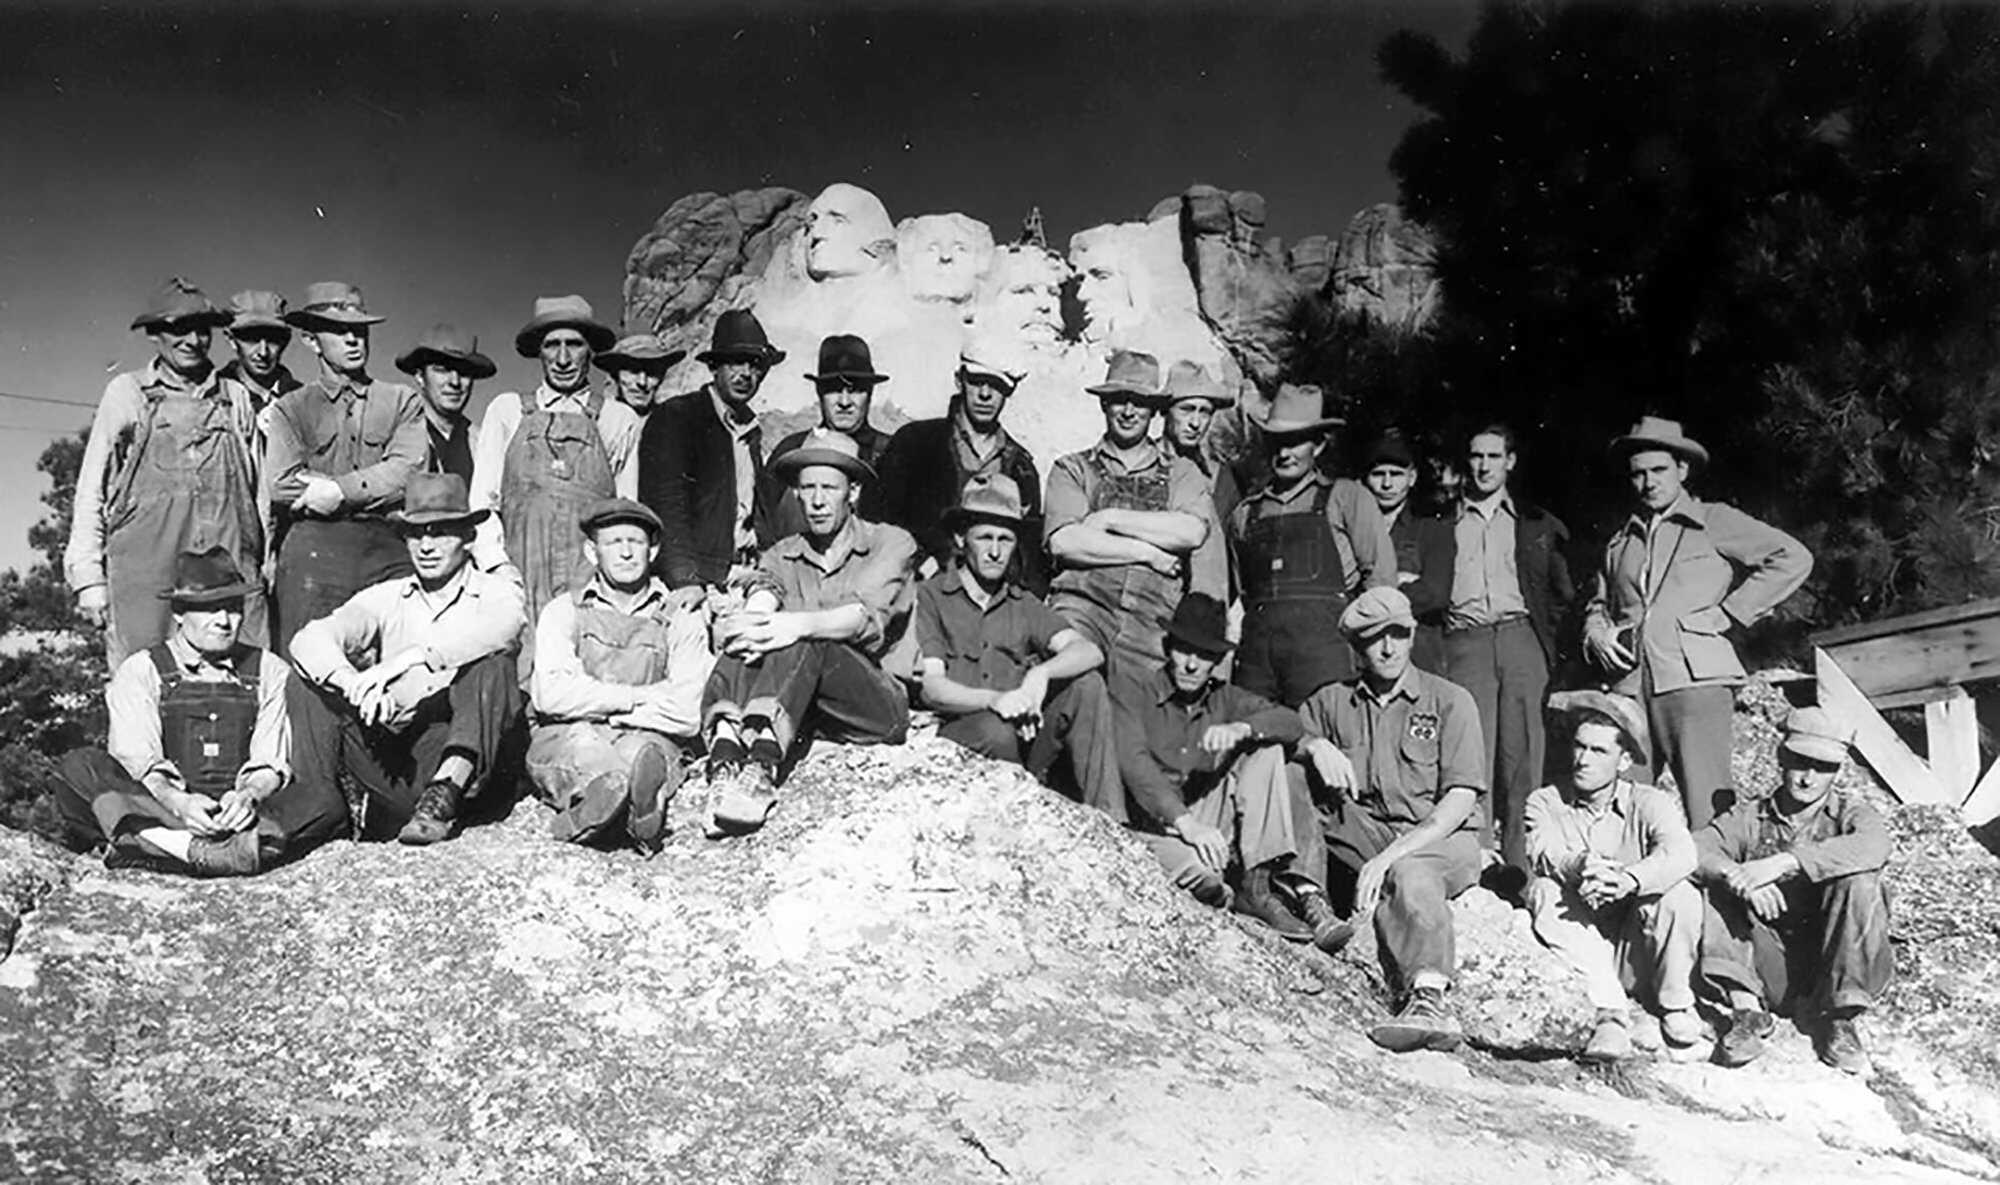 Rushmore-The-Keystone-Boys-workers-NPS.jpg